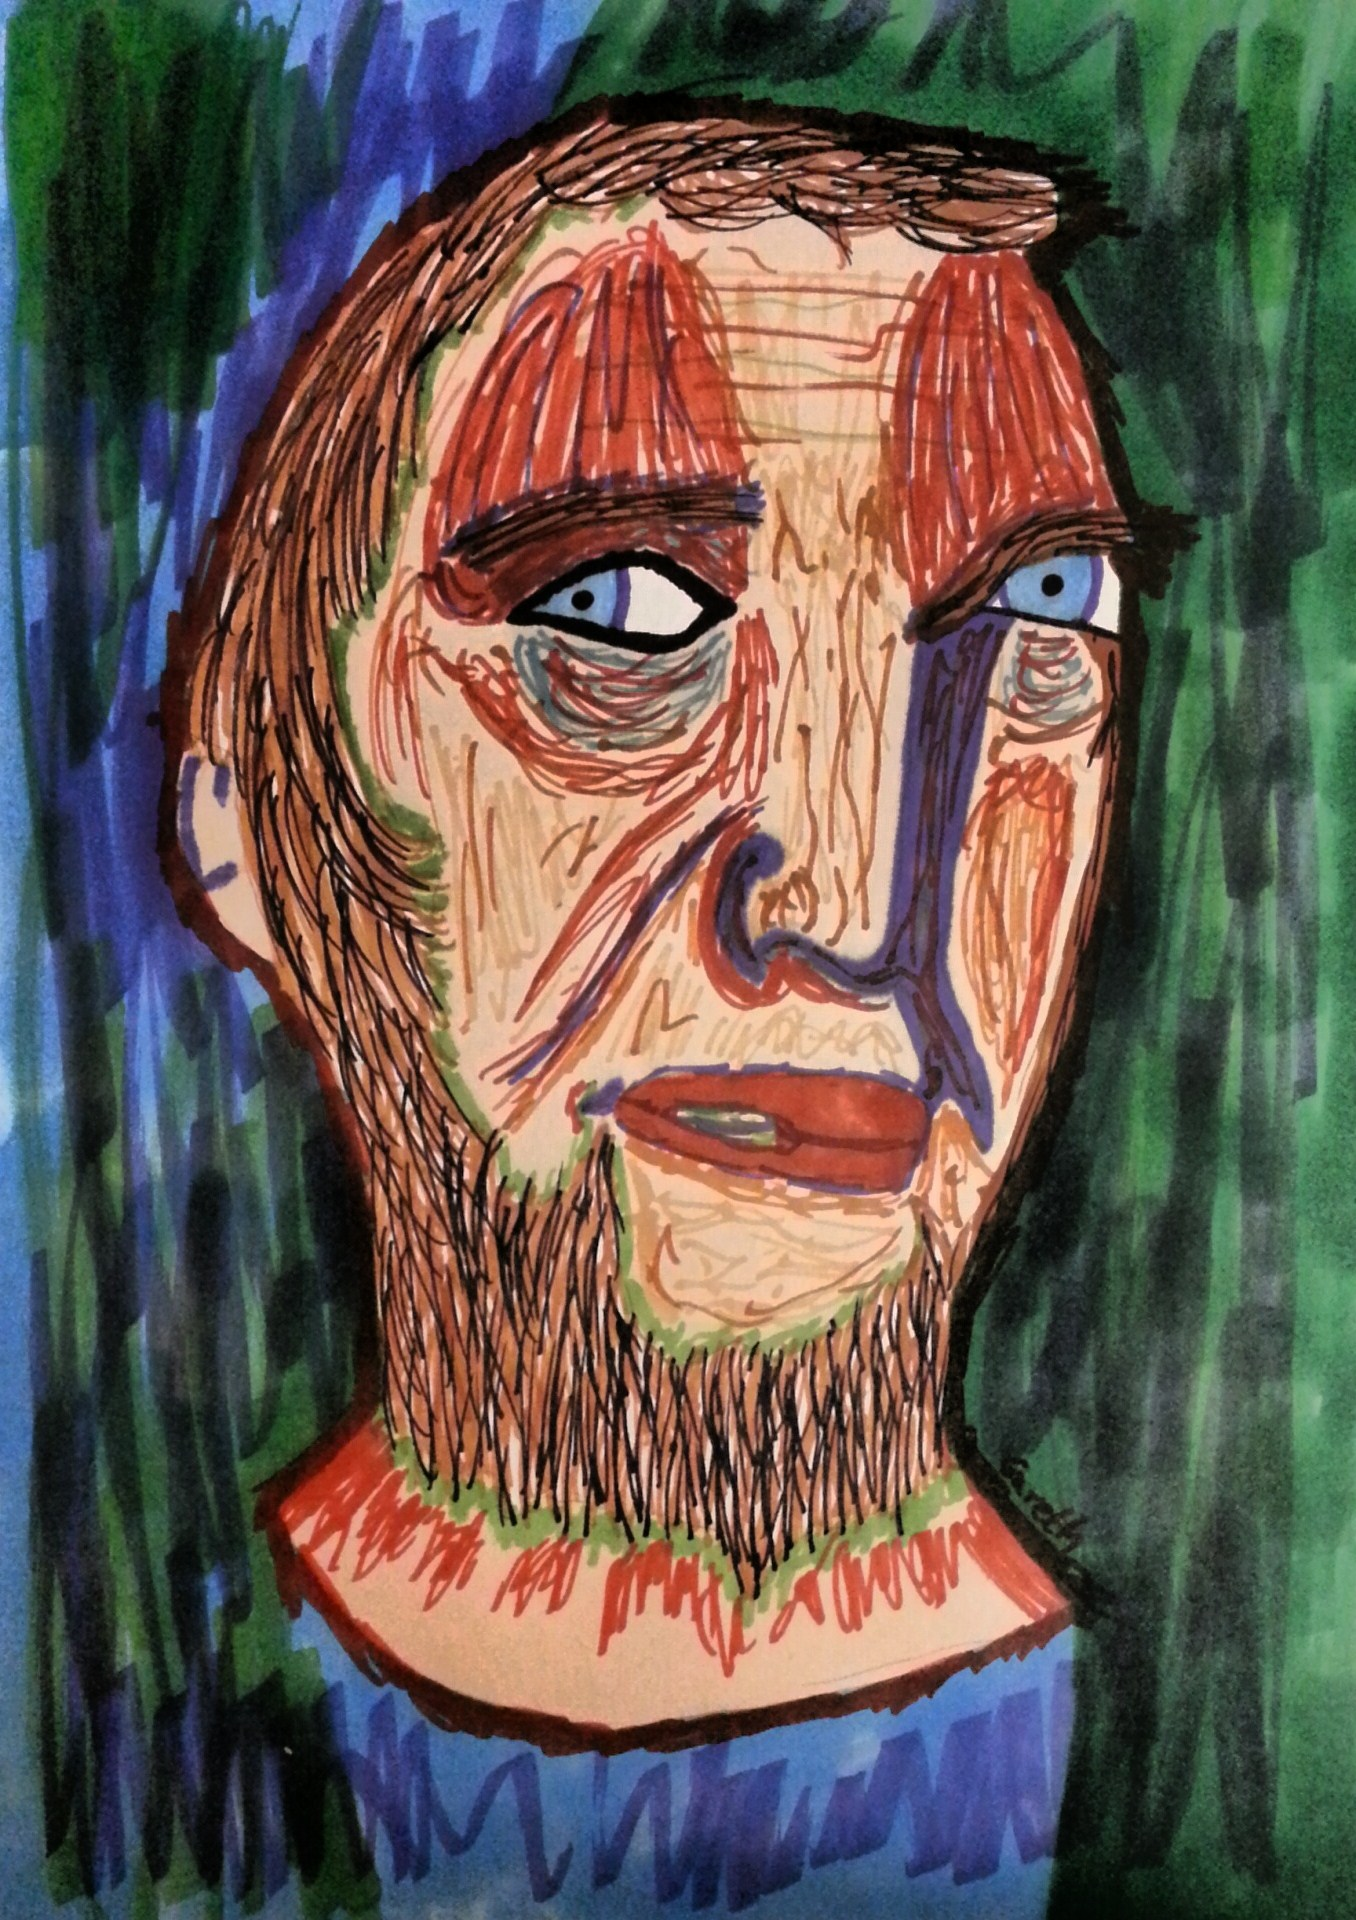 Self Portrait of Scoom